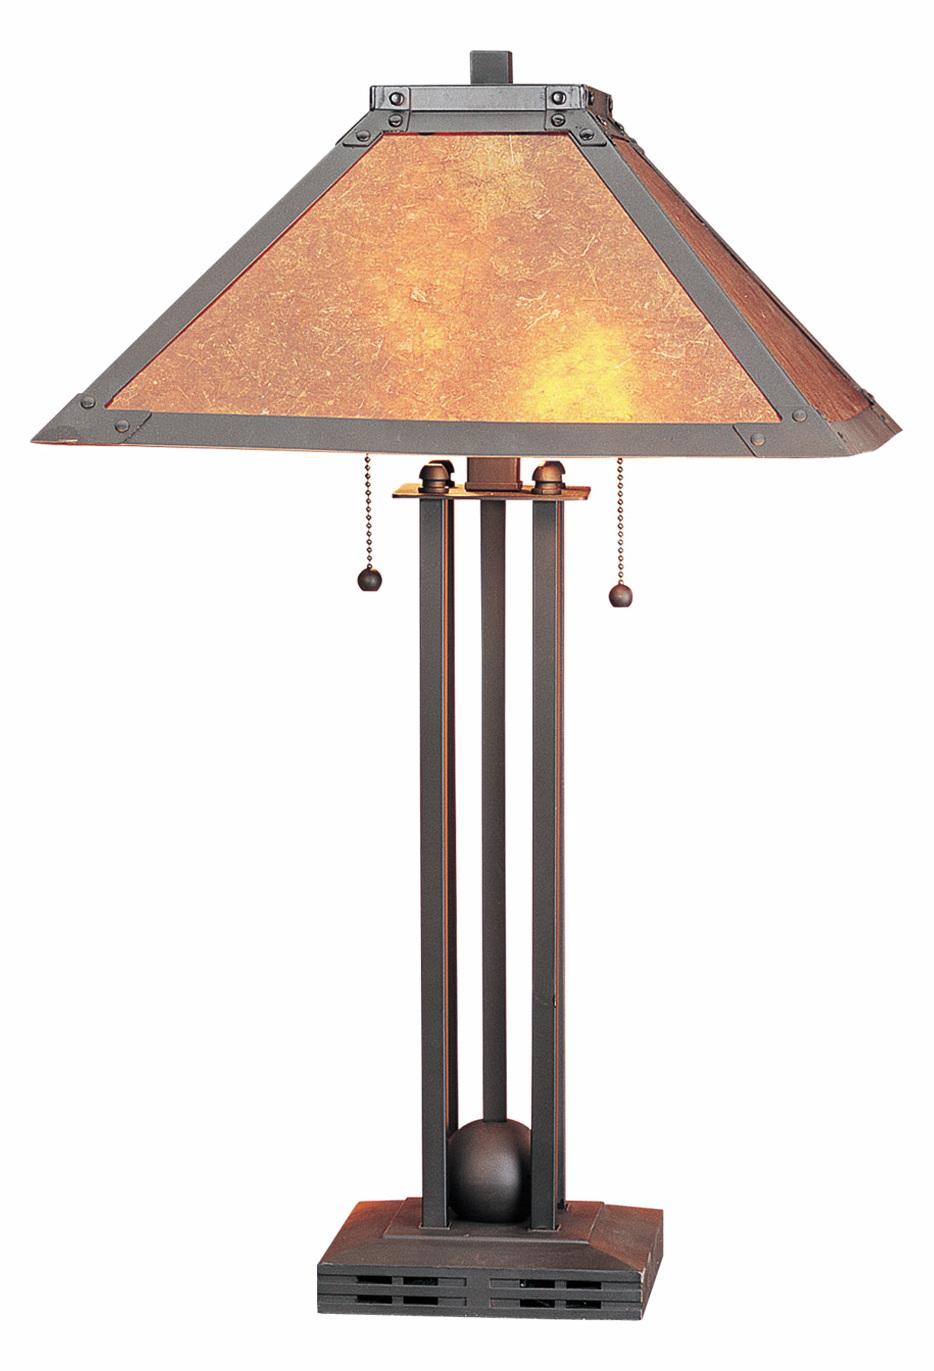 Cal lighting 60w x 2 table lamp w mica shade matt black bo for Cars 2 table lamp